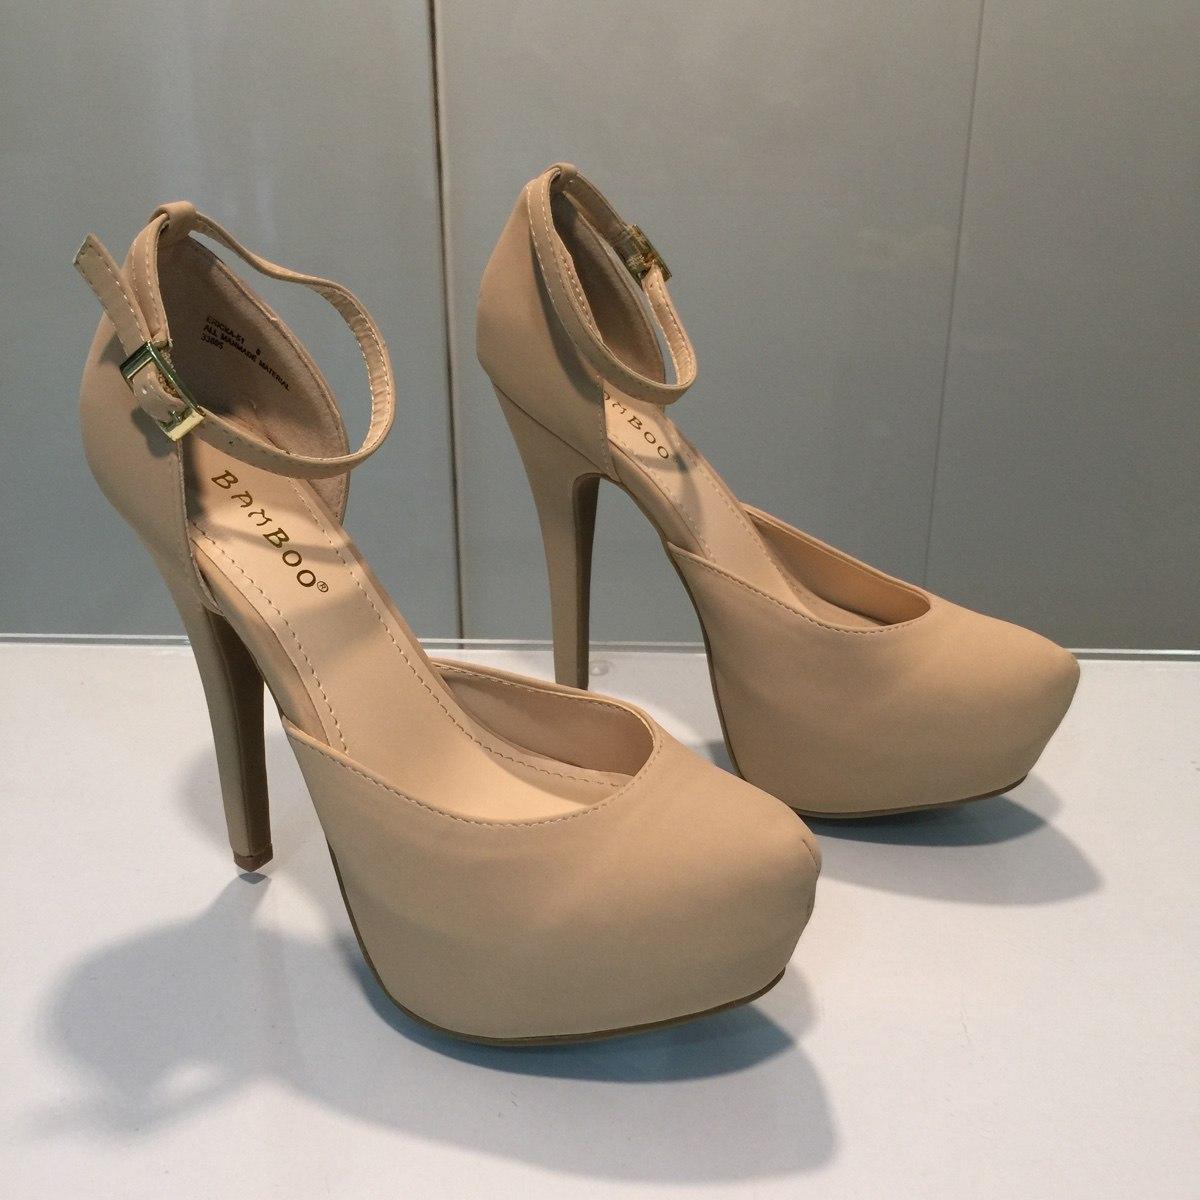 05b1e9a0 zapato nude beige de tacón para damas importadas hellas. Cargando zoom.